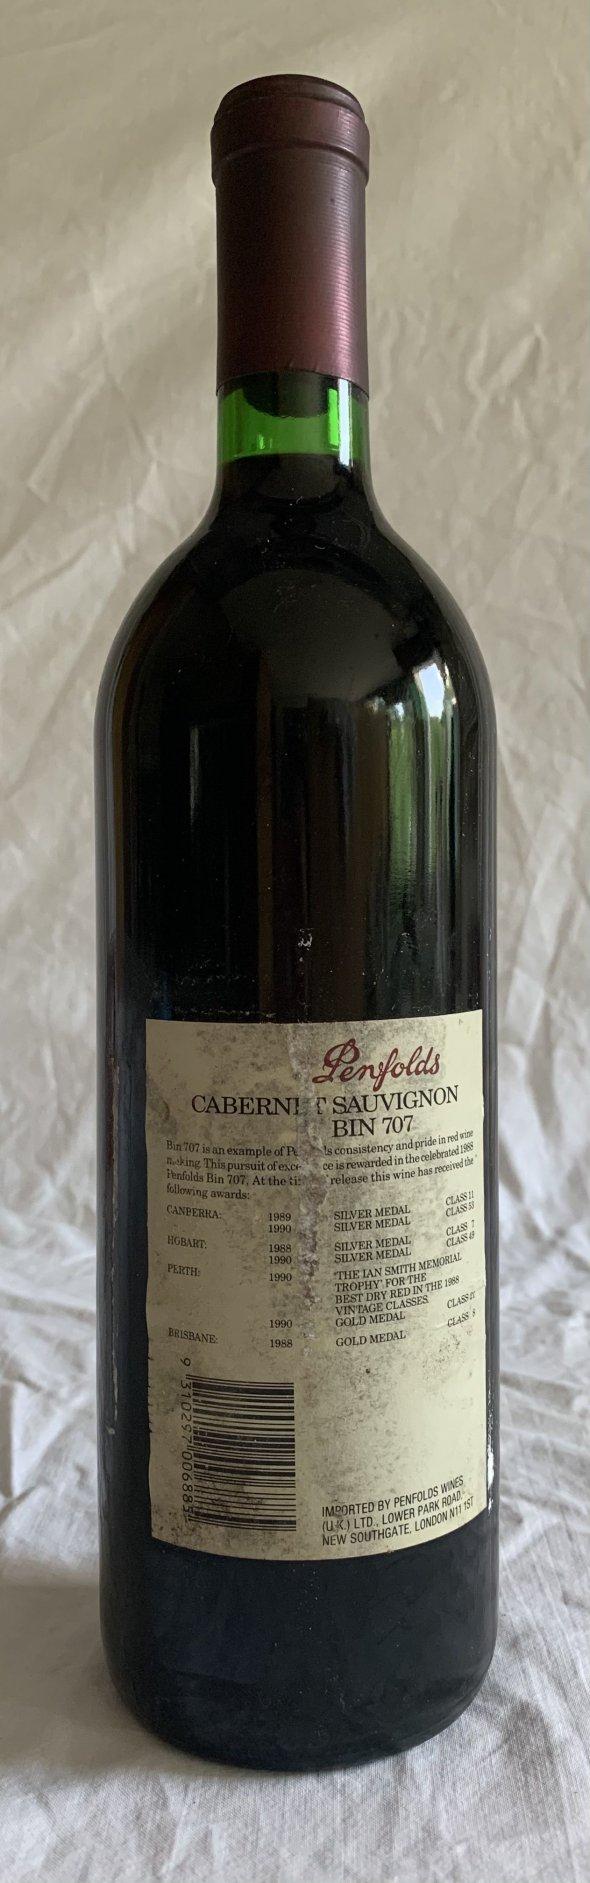 Penfolds Cabernet Sauvignon Bin 707